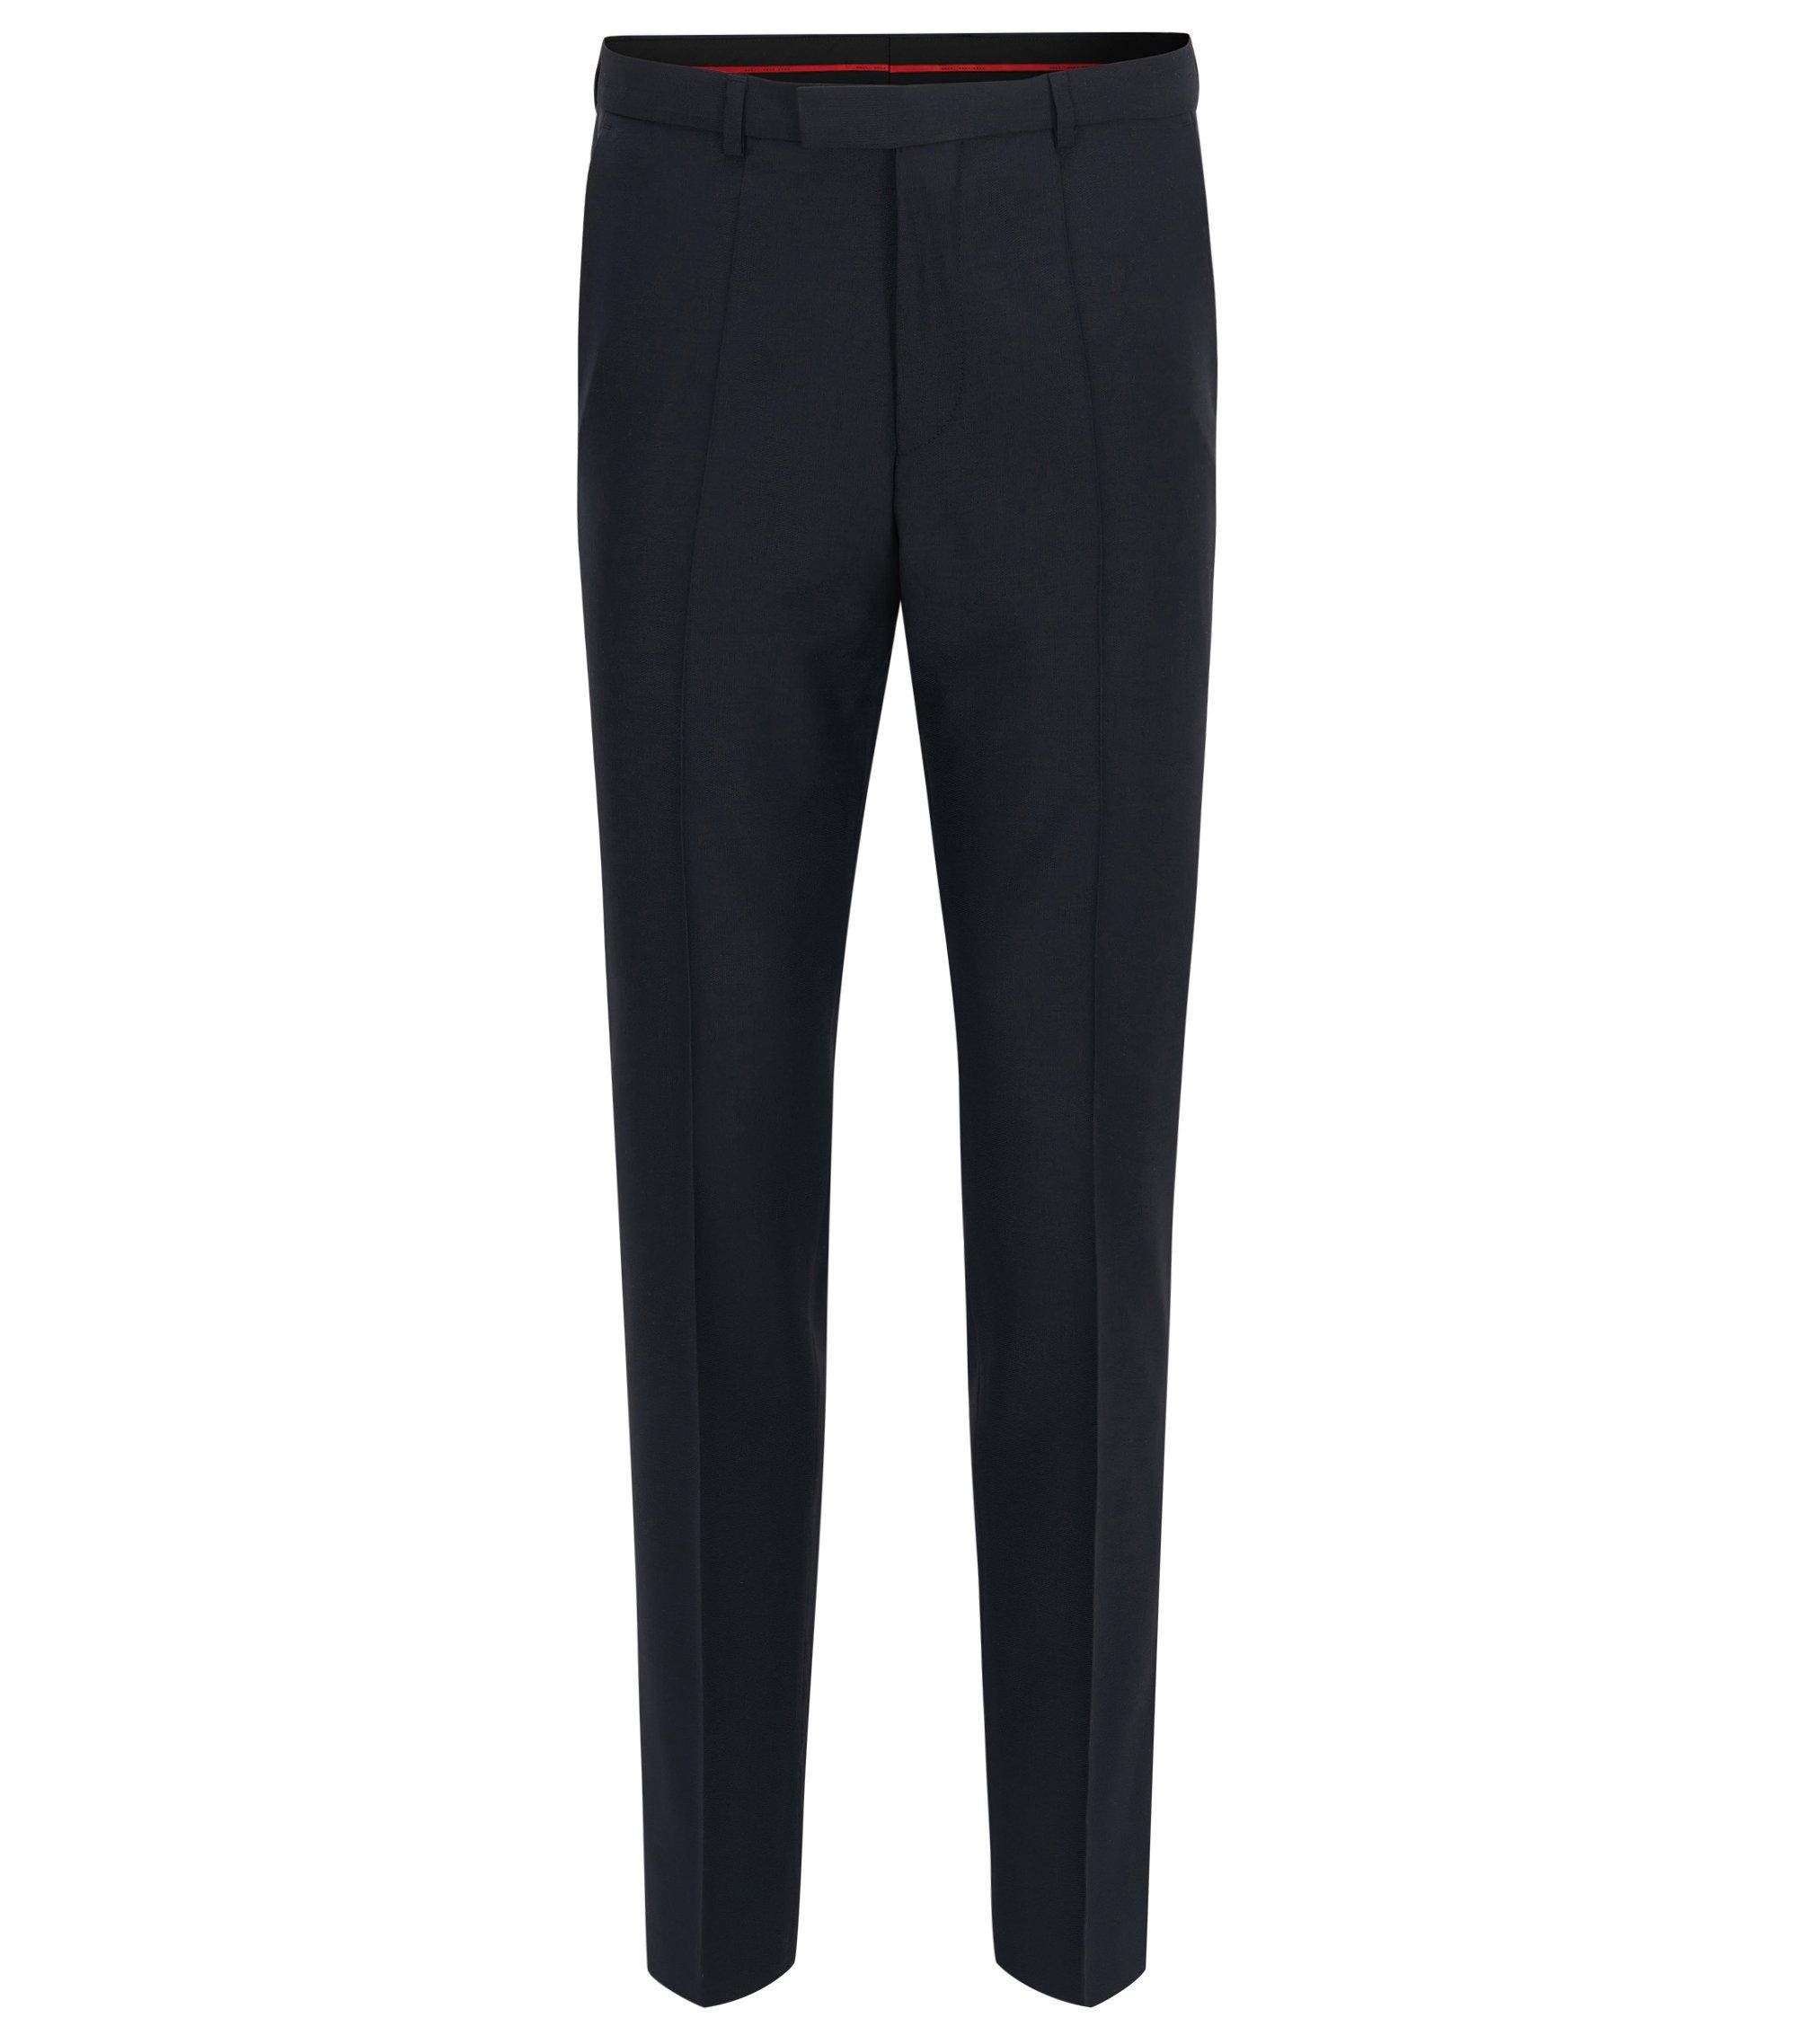 Pantaloni regular fit HUGO Uomo in lana vergine, Blu scuro